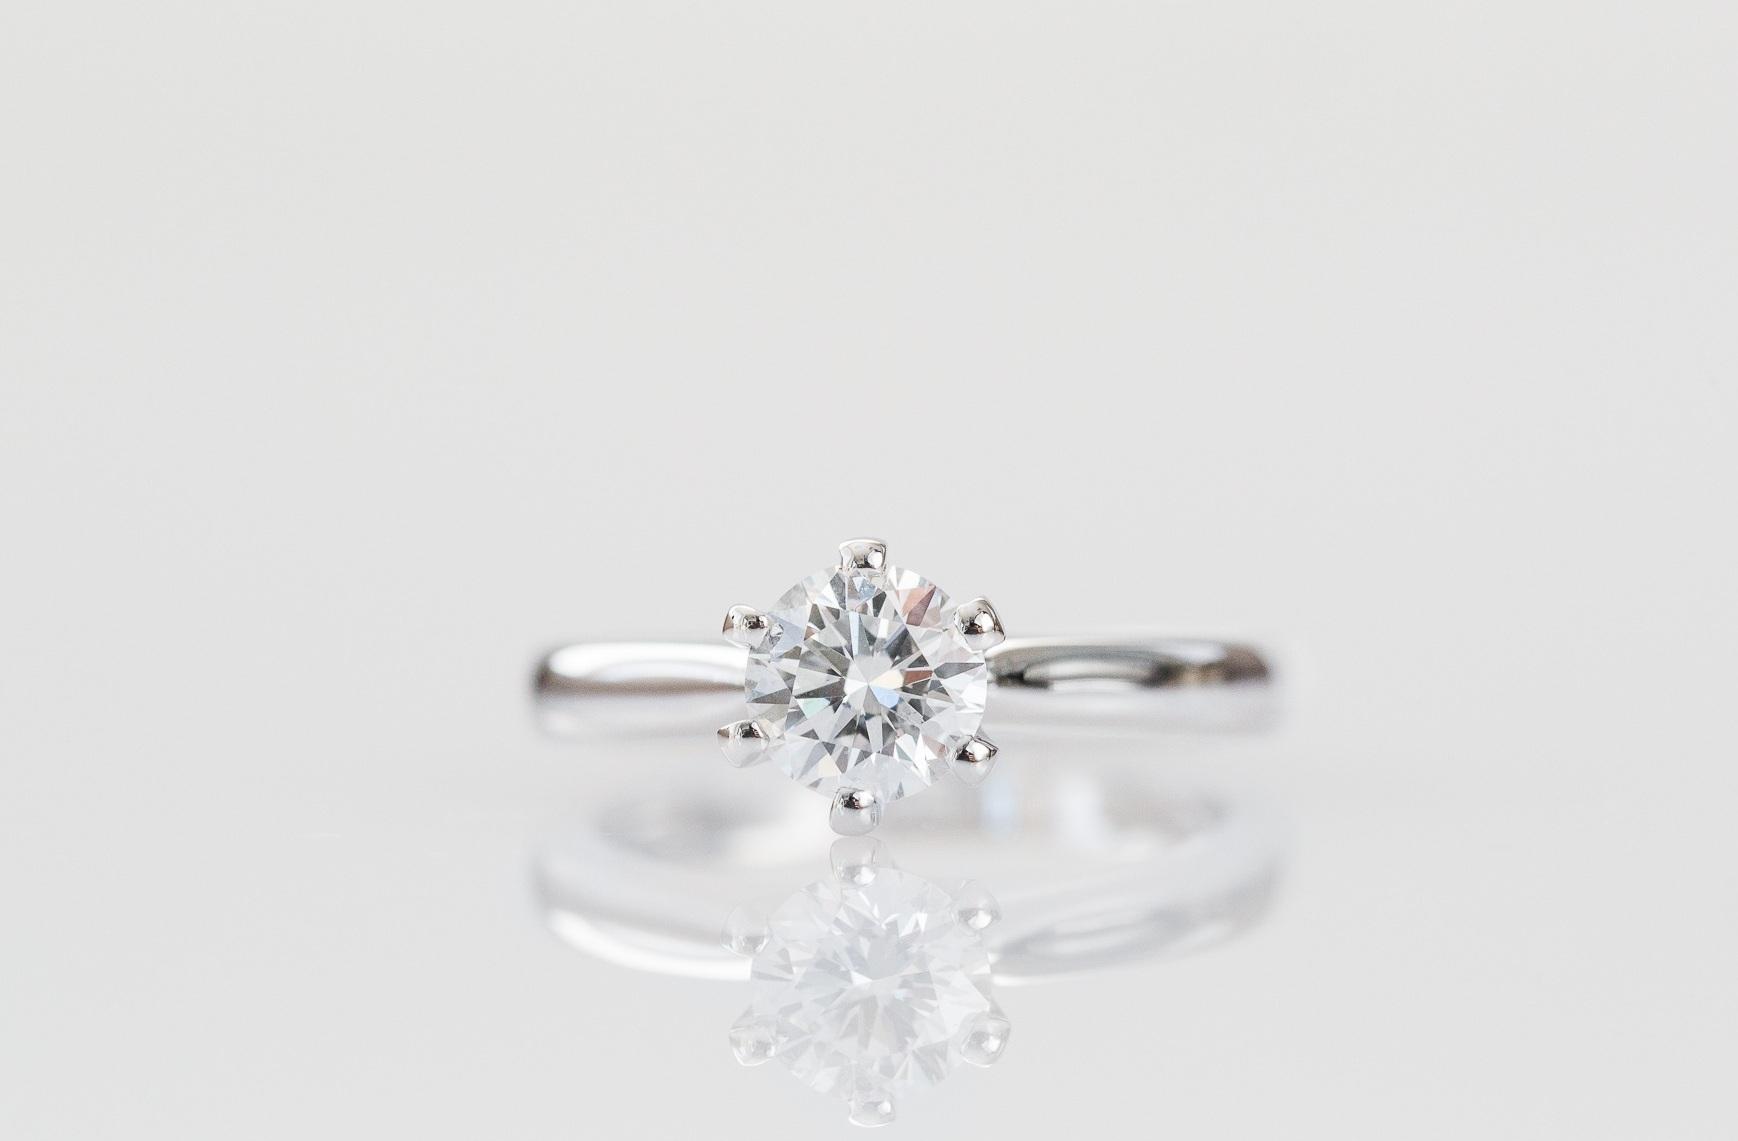 Six claw round diamond engagement ring.